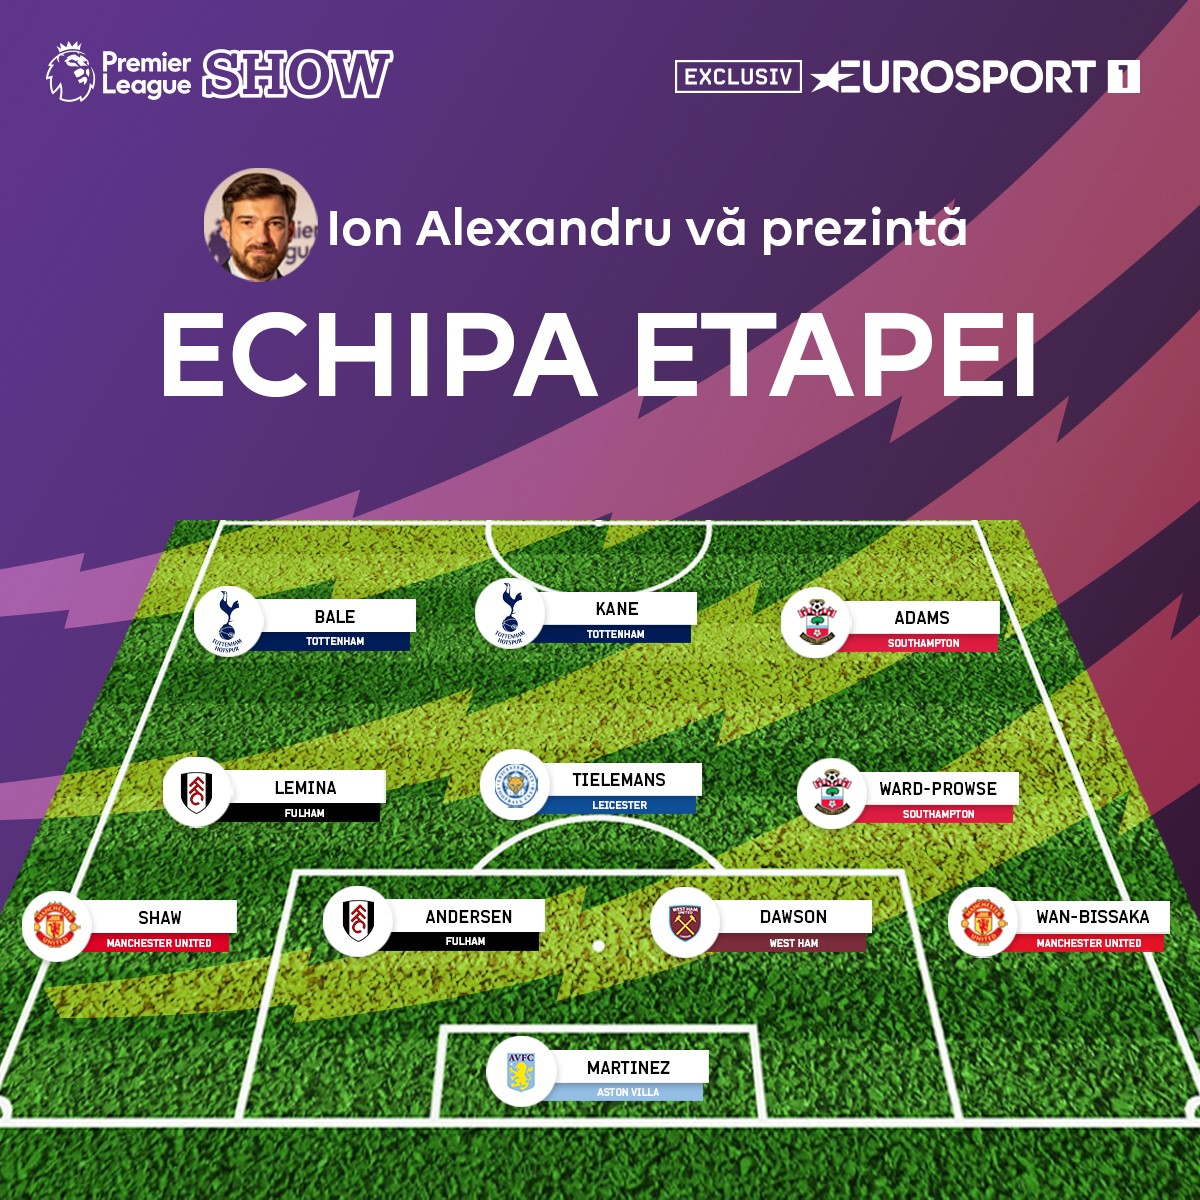 https://i.eurosport.com/2021/03/09/3008673.jpg